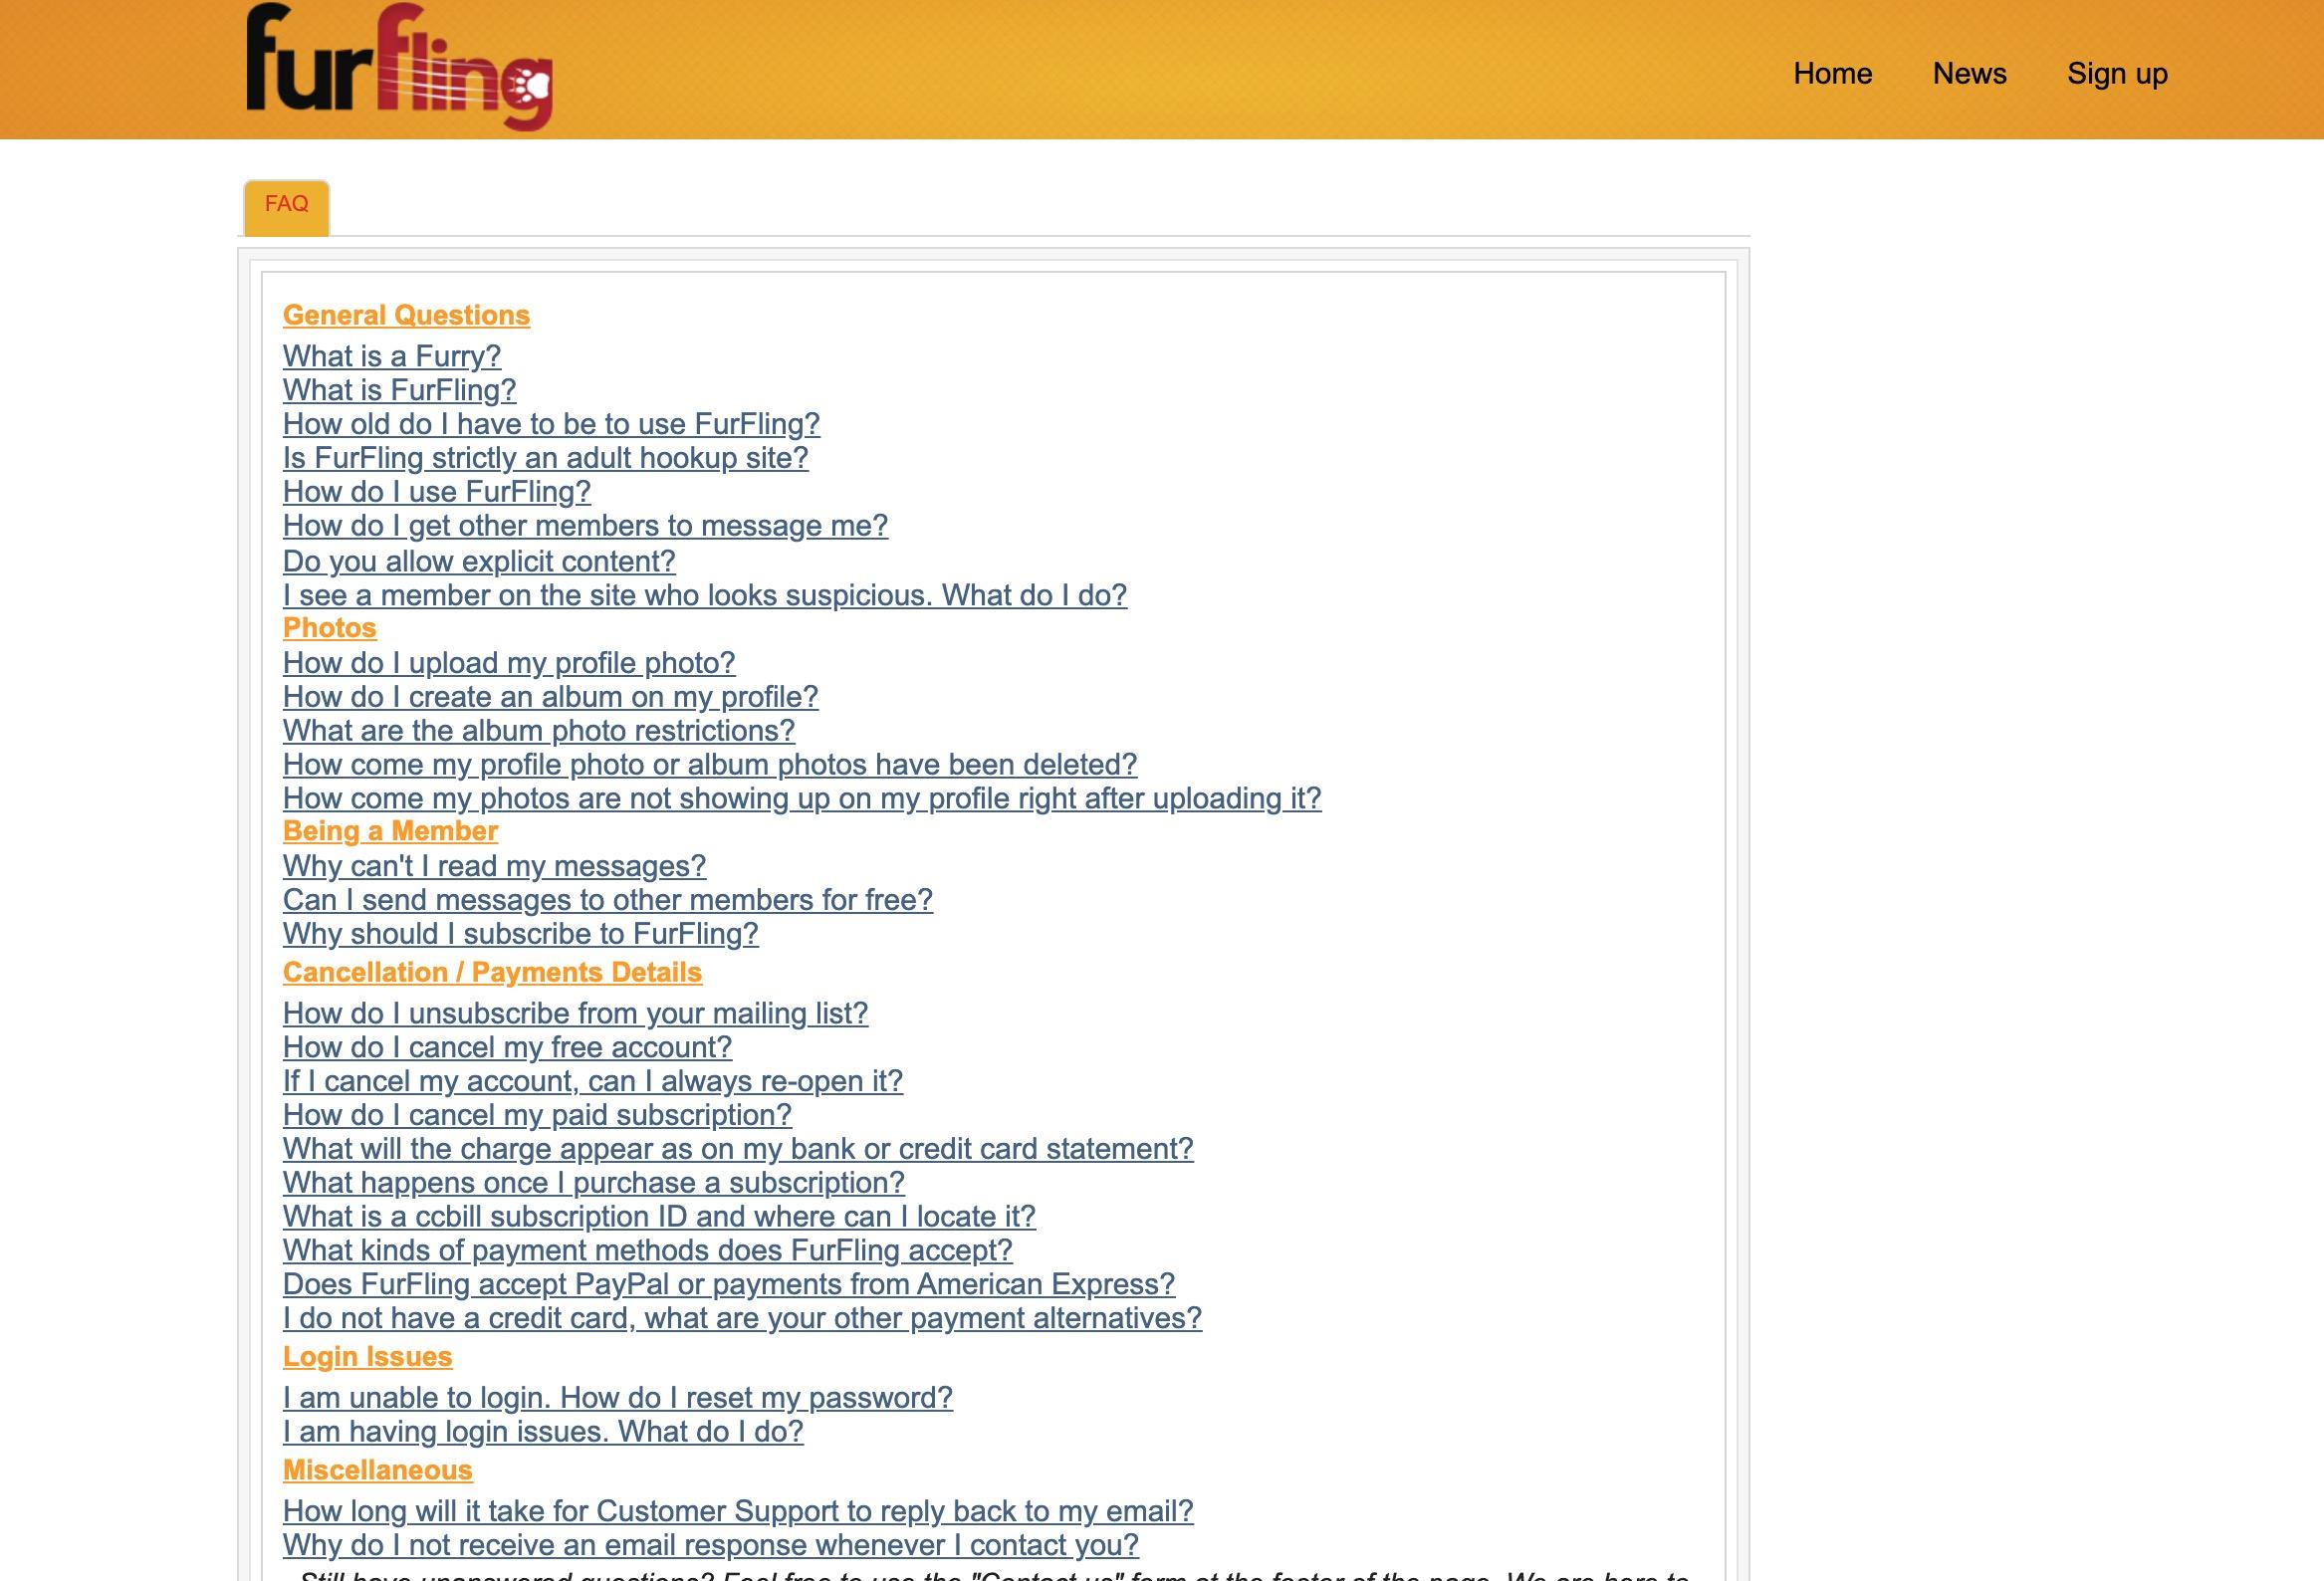 FurFling FAQ